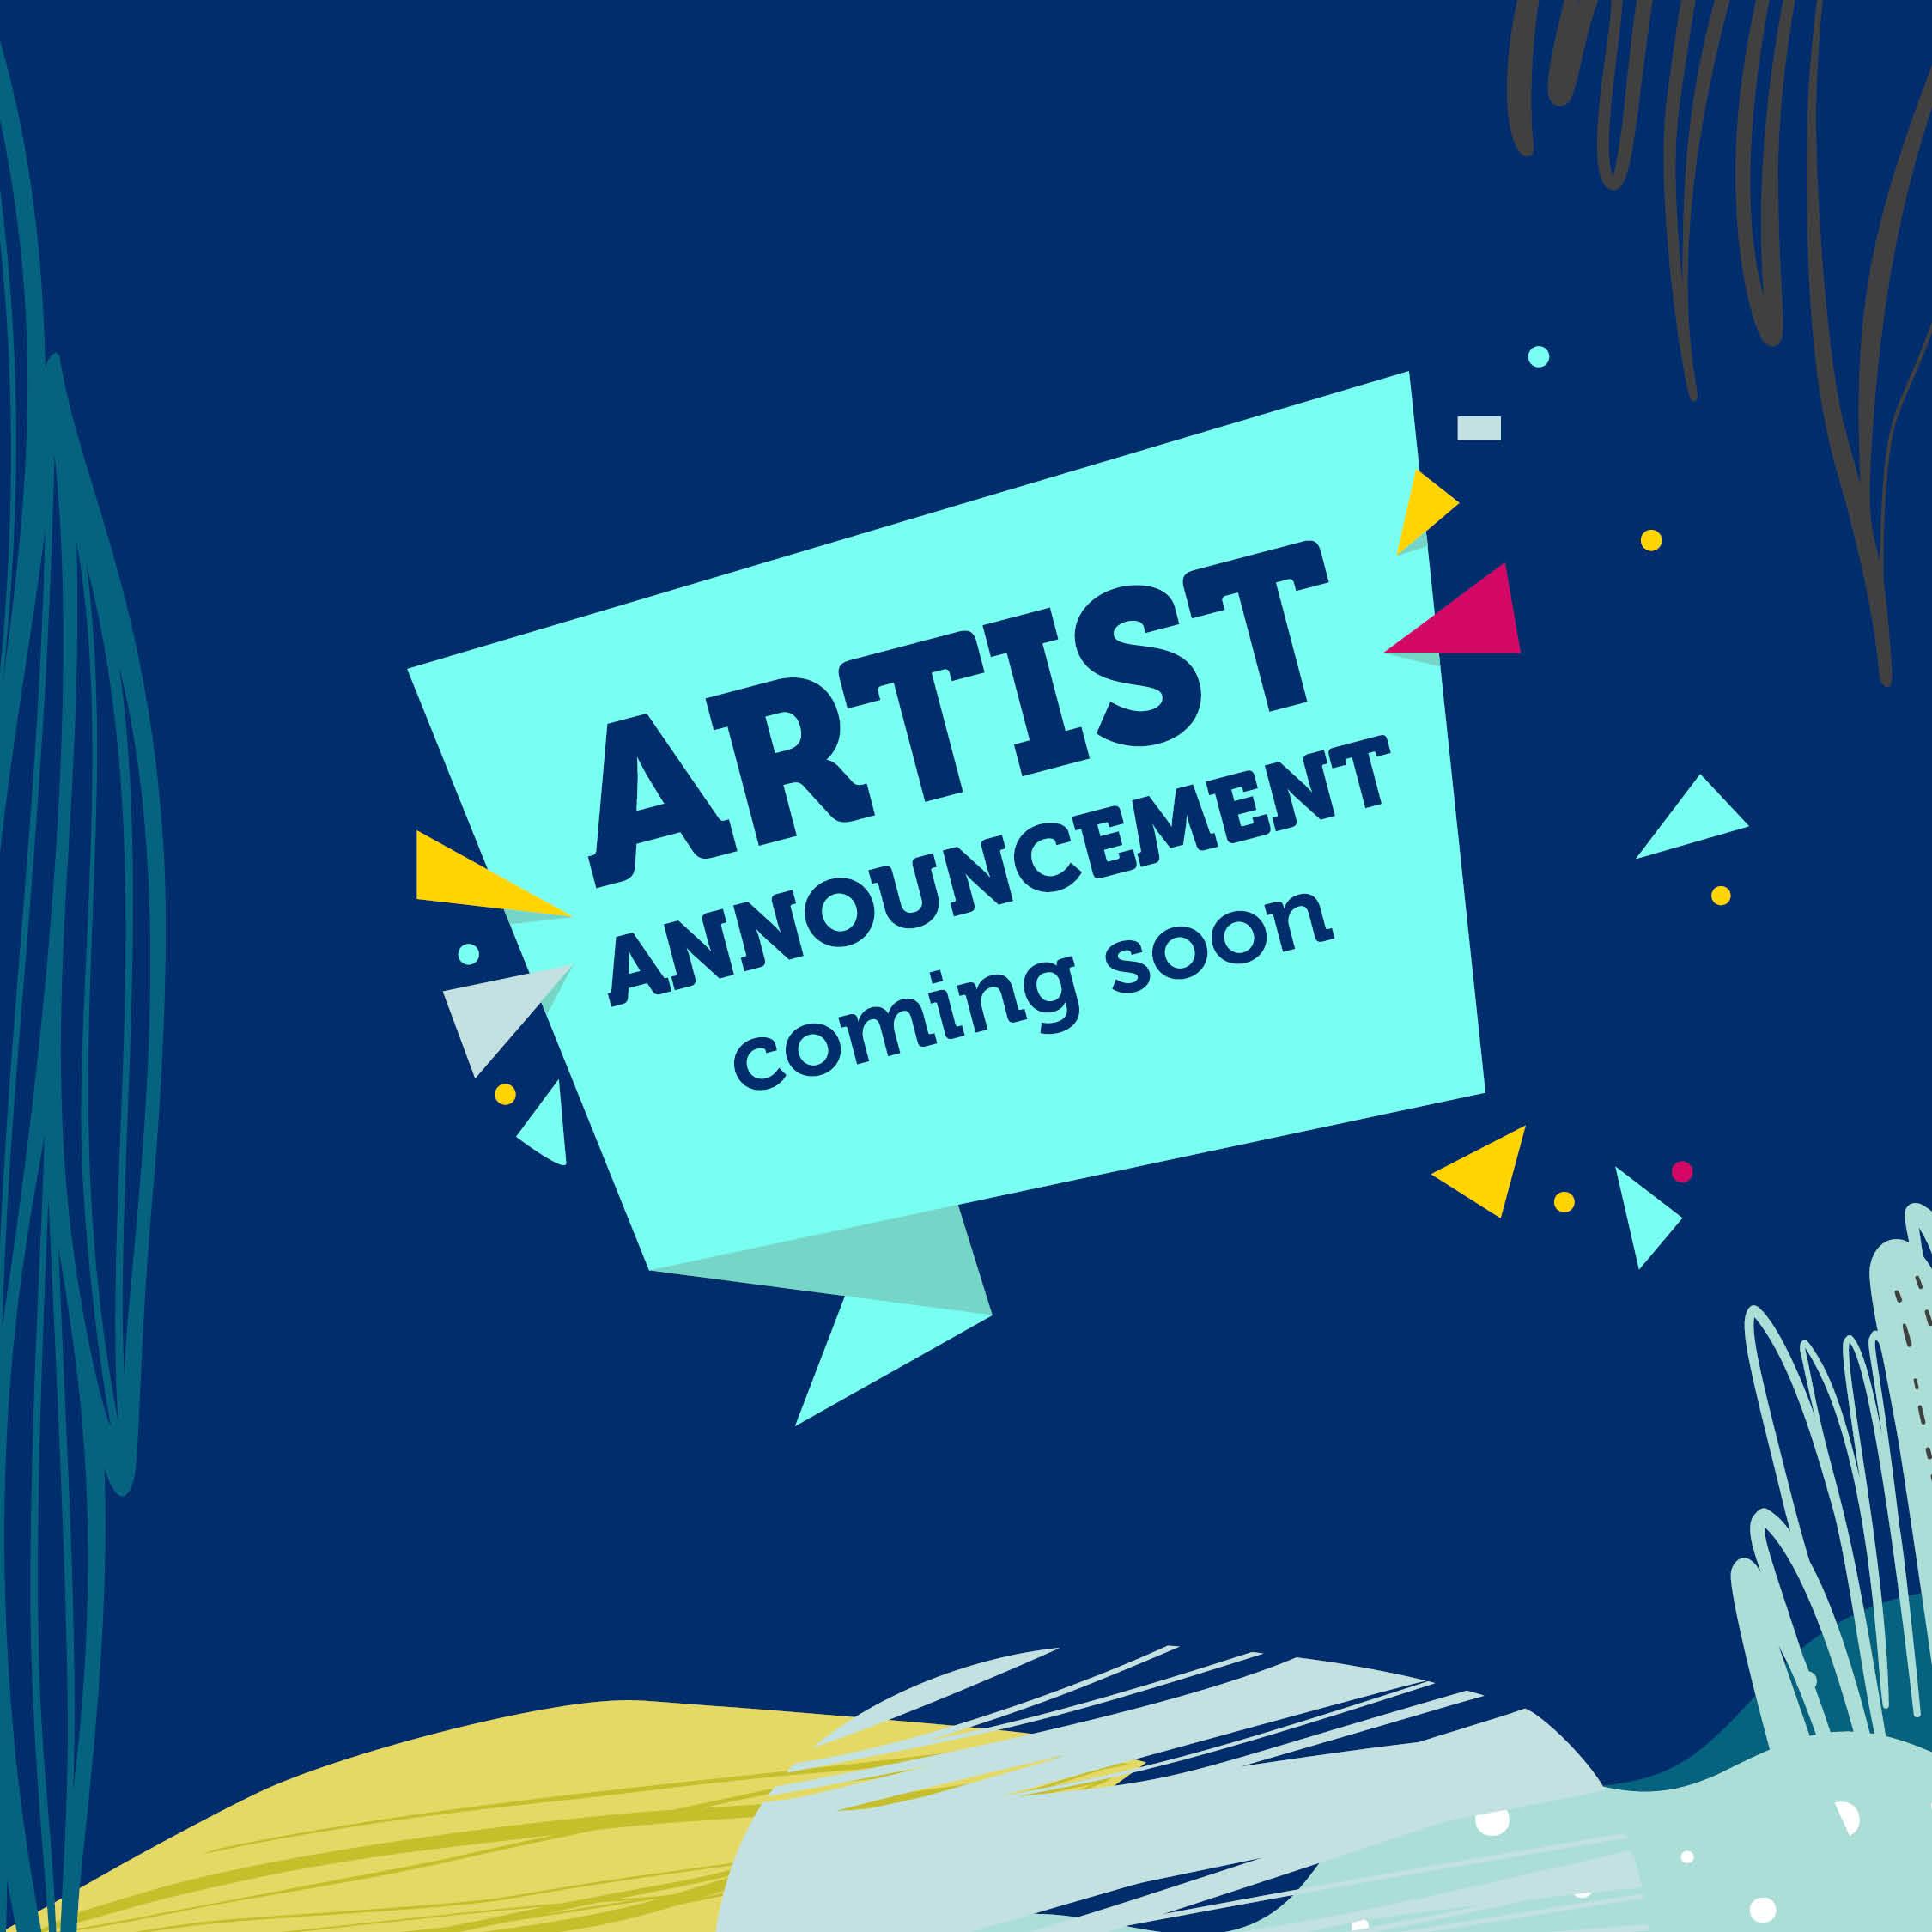 https://blovemusic.com/wp-content/uploads/2020/01/34352-BLOVE_Headline-announcement-coming-soon-web-images-Jan4.jpg